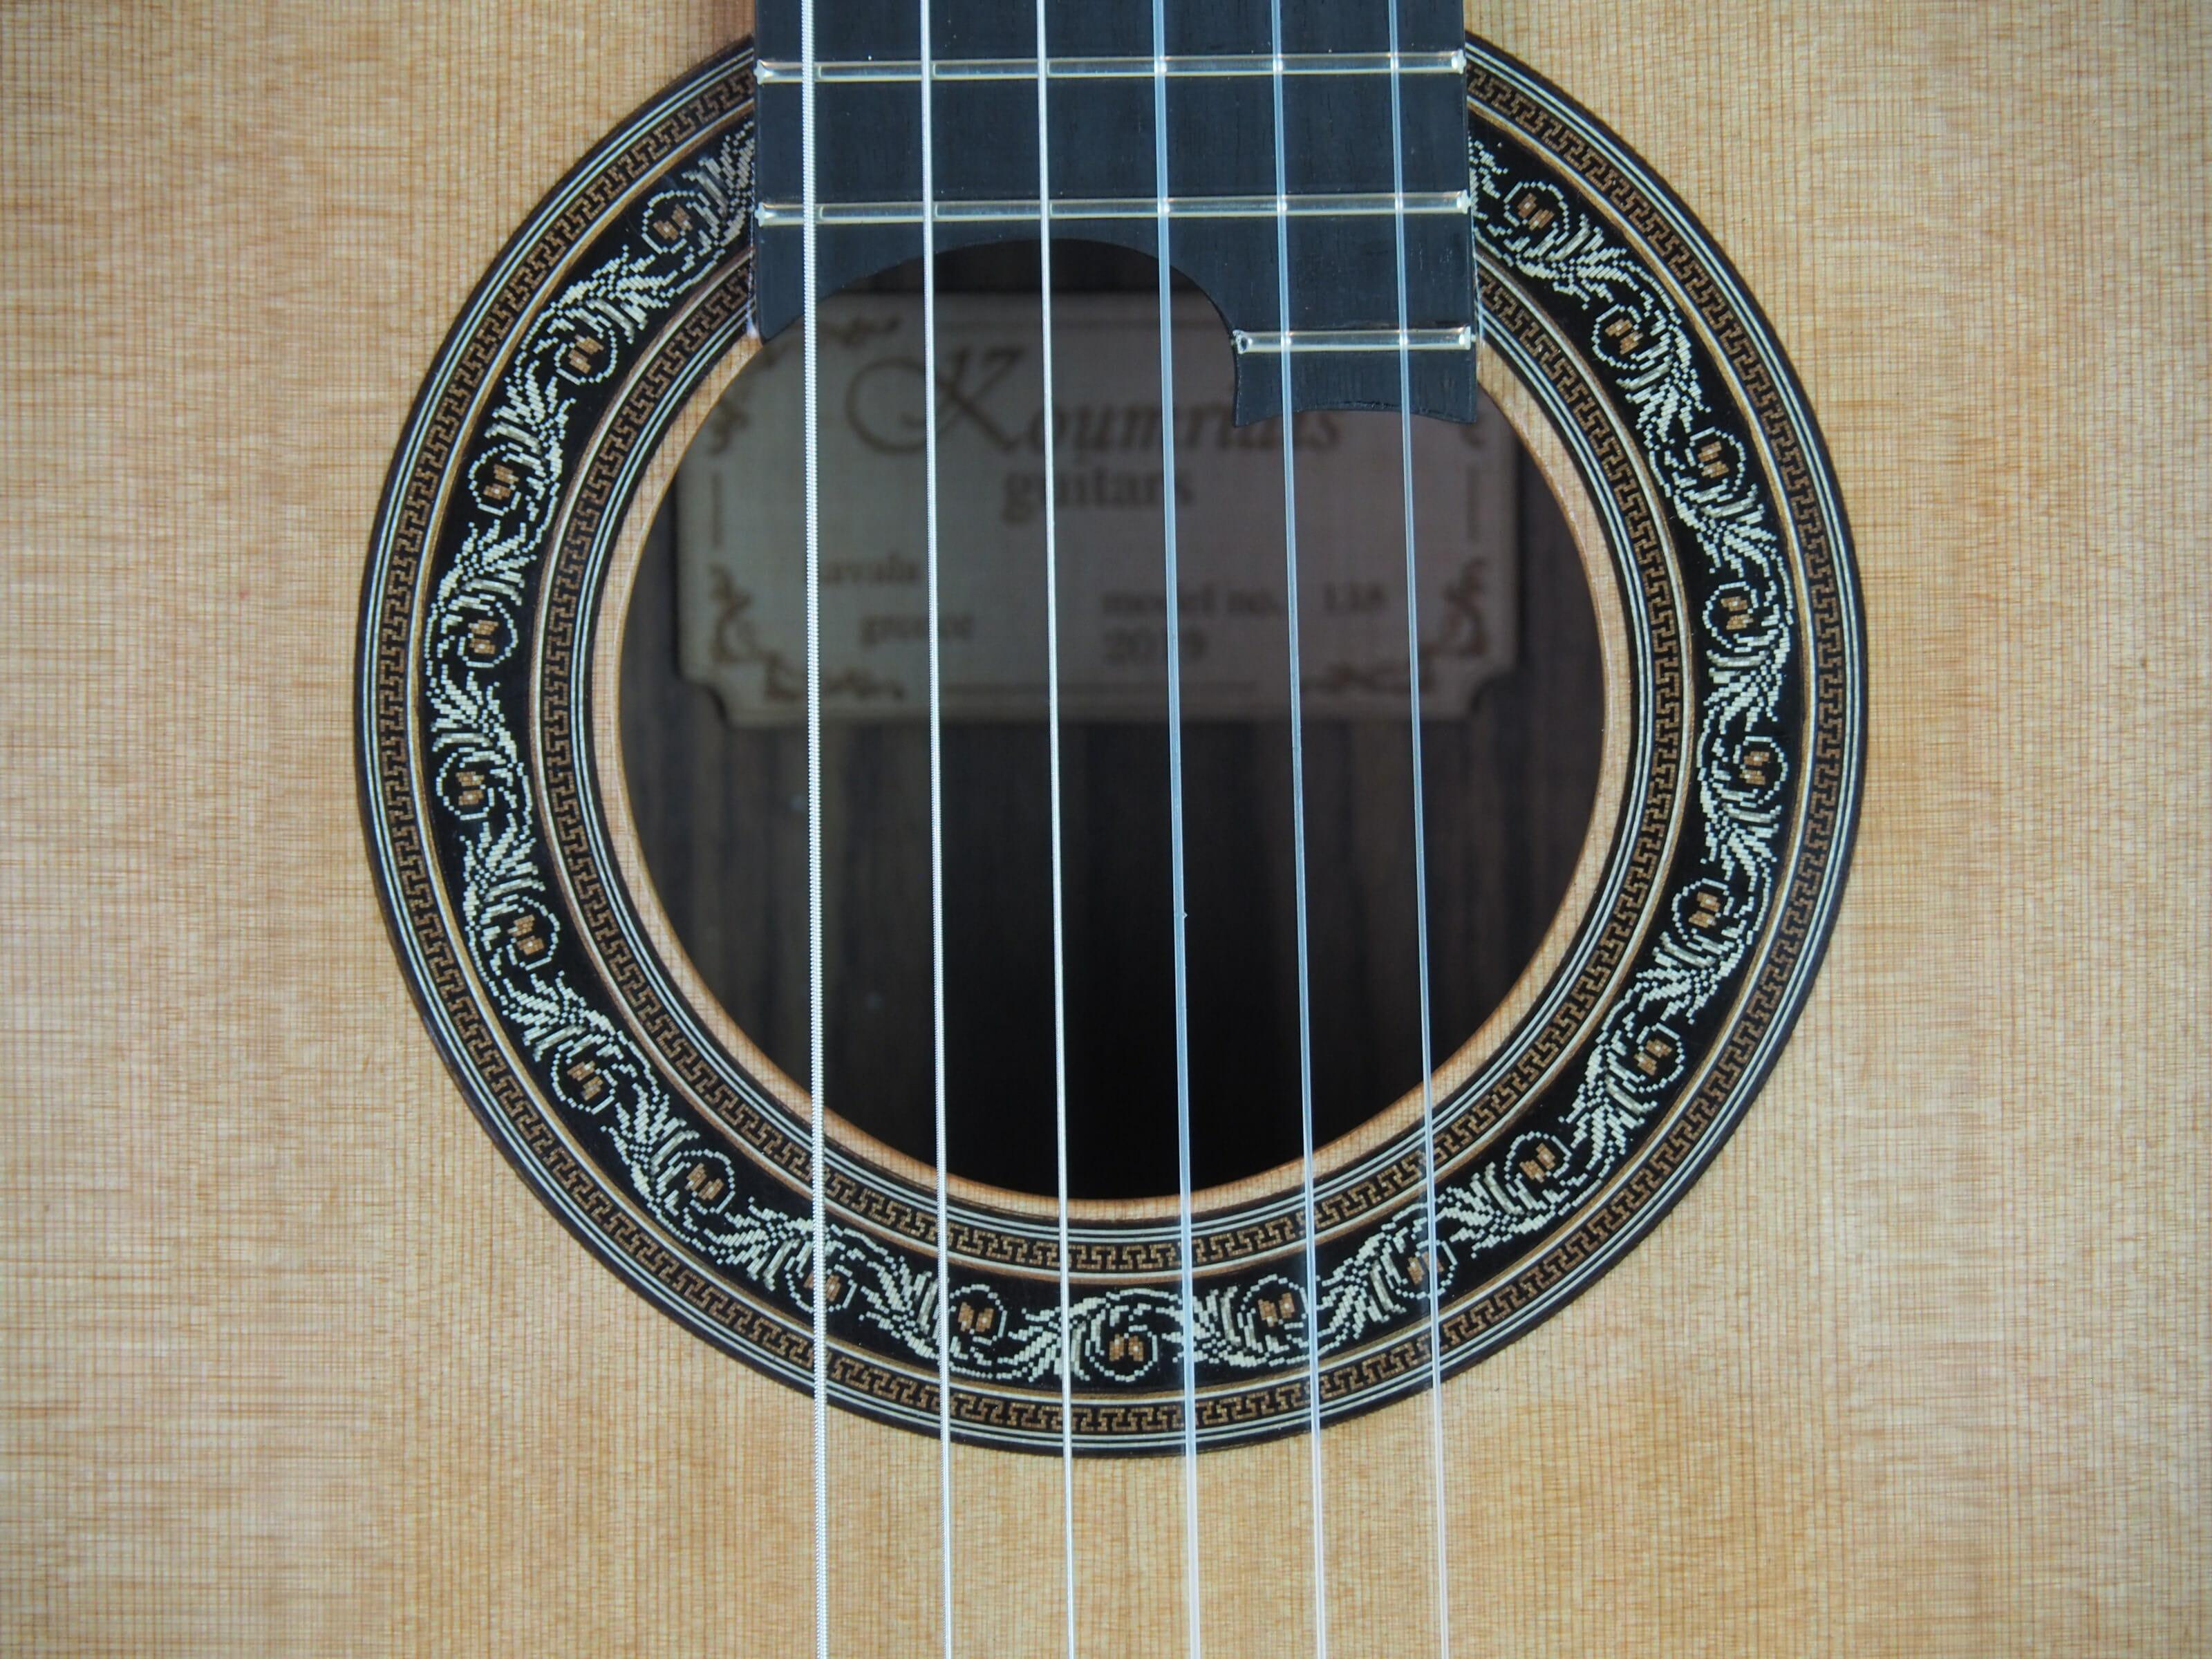 Charalampos Koumridis Luthier guitare classique N°139 19KOU139-07